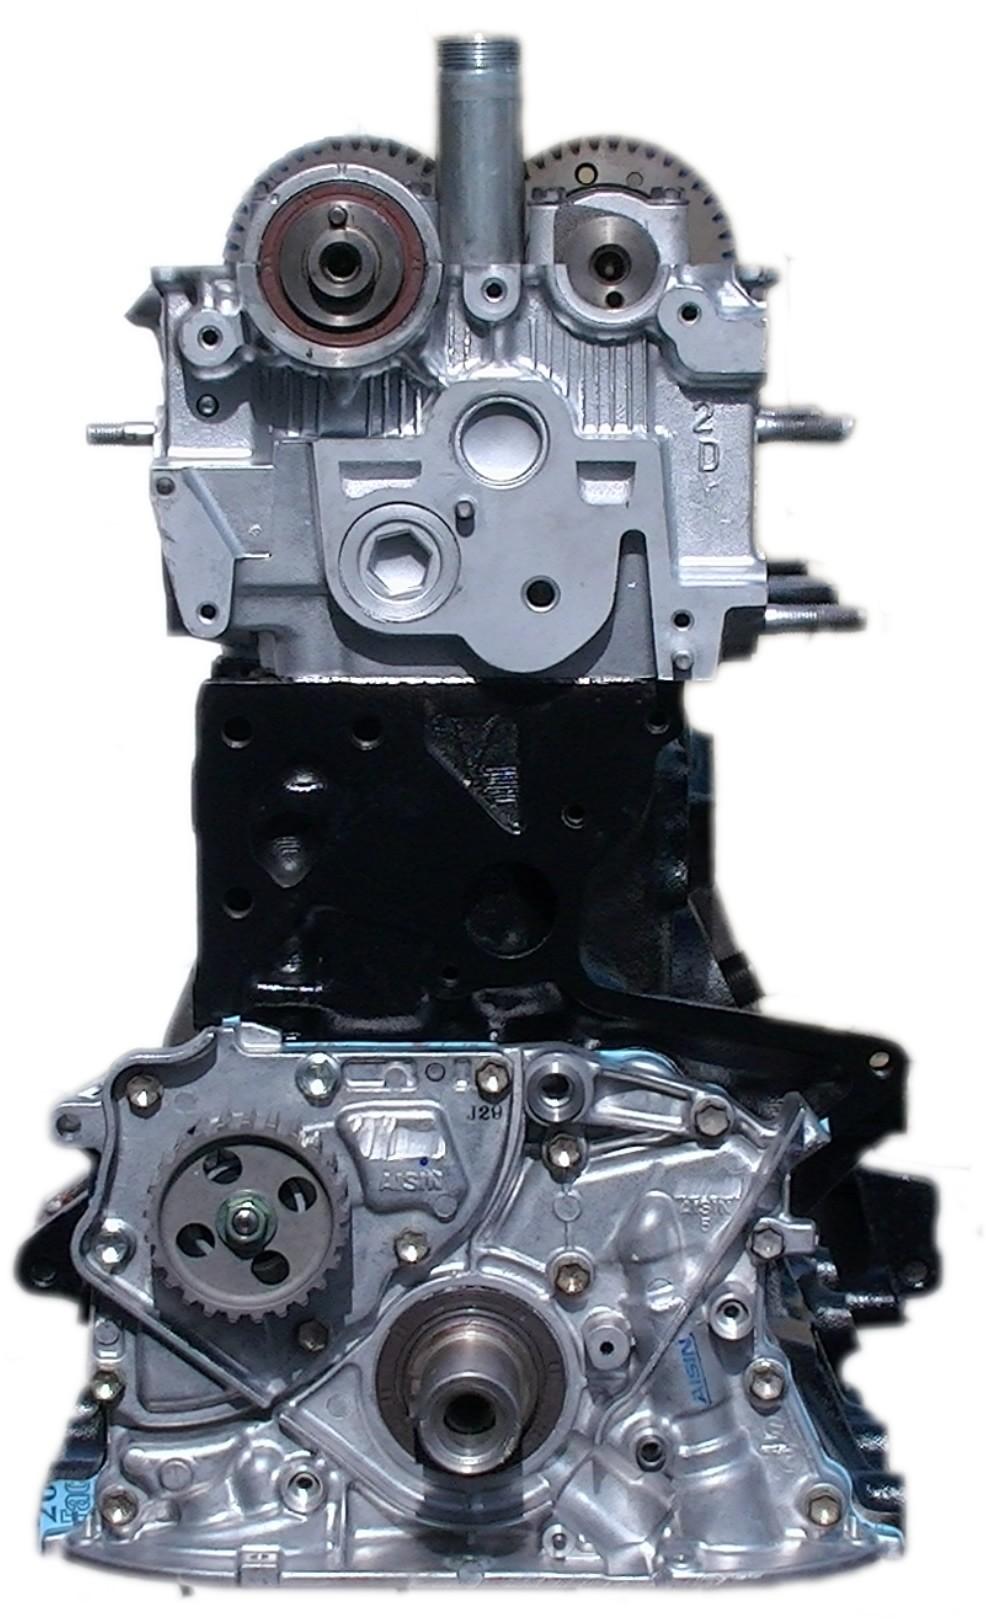 rebuilt 96 toyota camry 2 2l 5sfe 4cyl engine kar king auto kar king auto